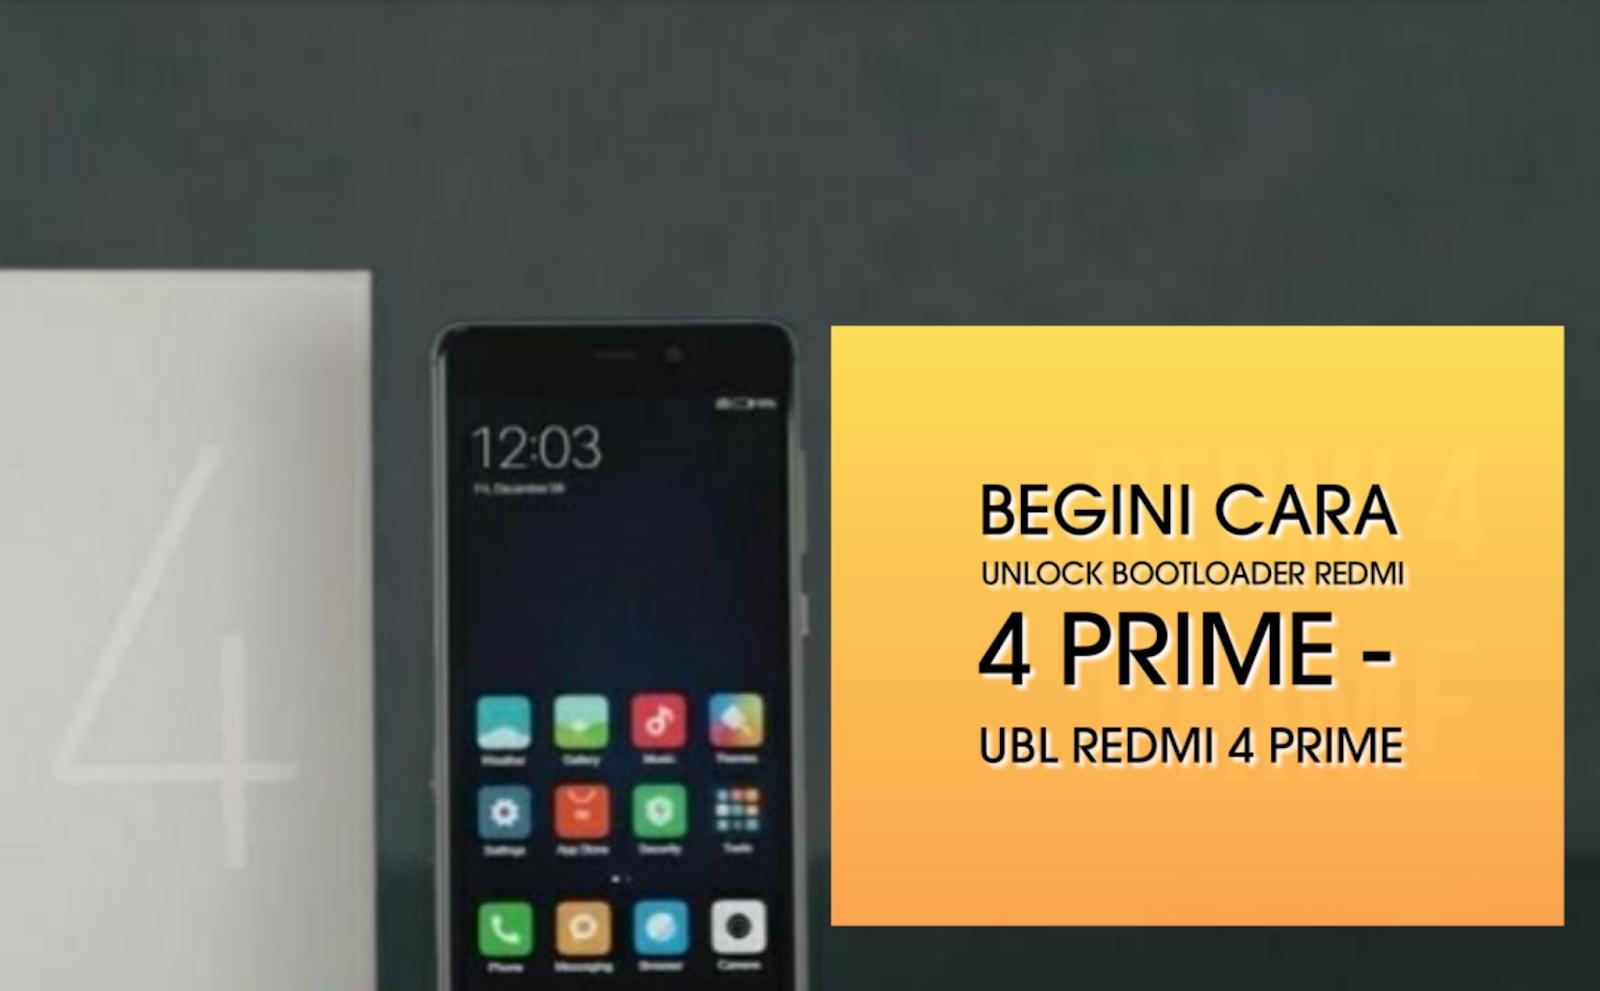 Cara unlock bootloader redmi 4 prime - UBL redmi 4 Prime